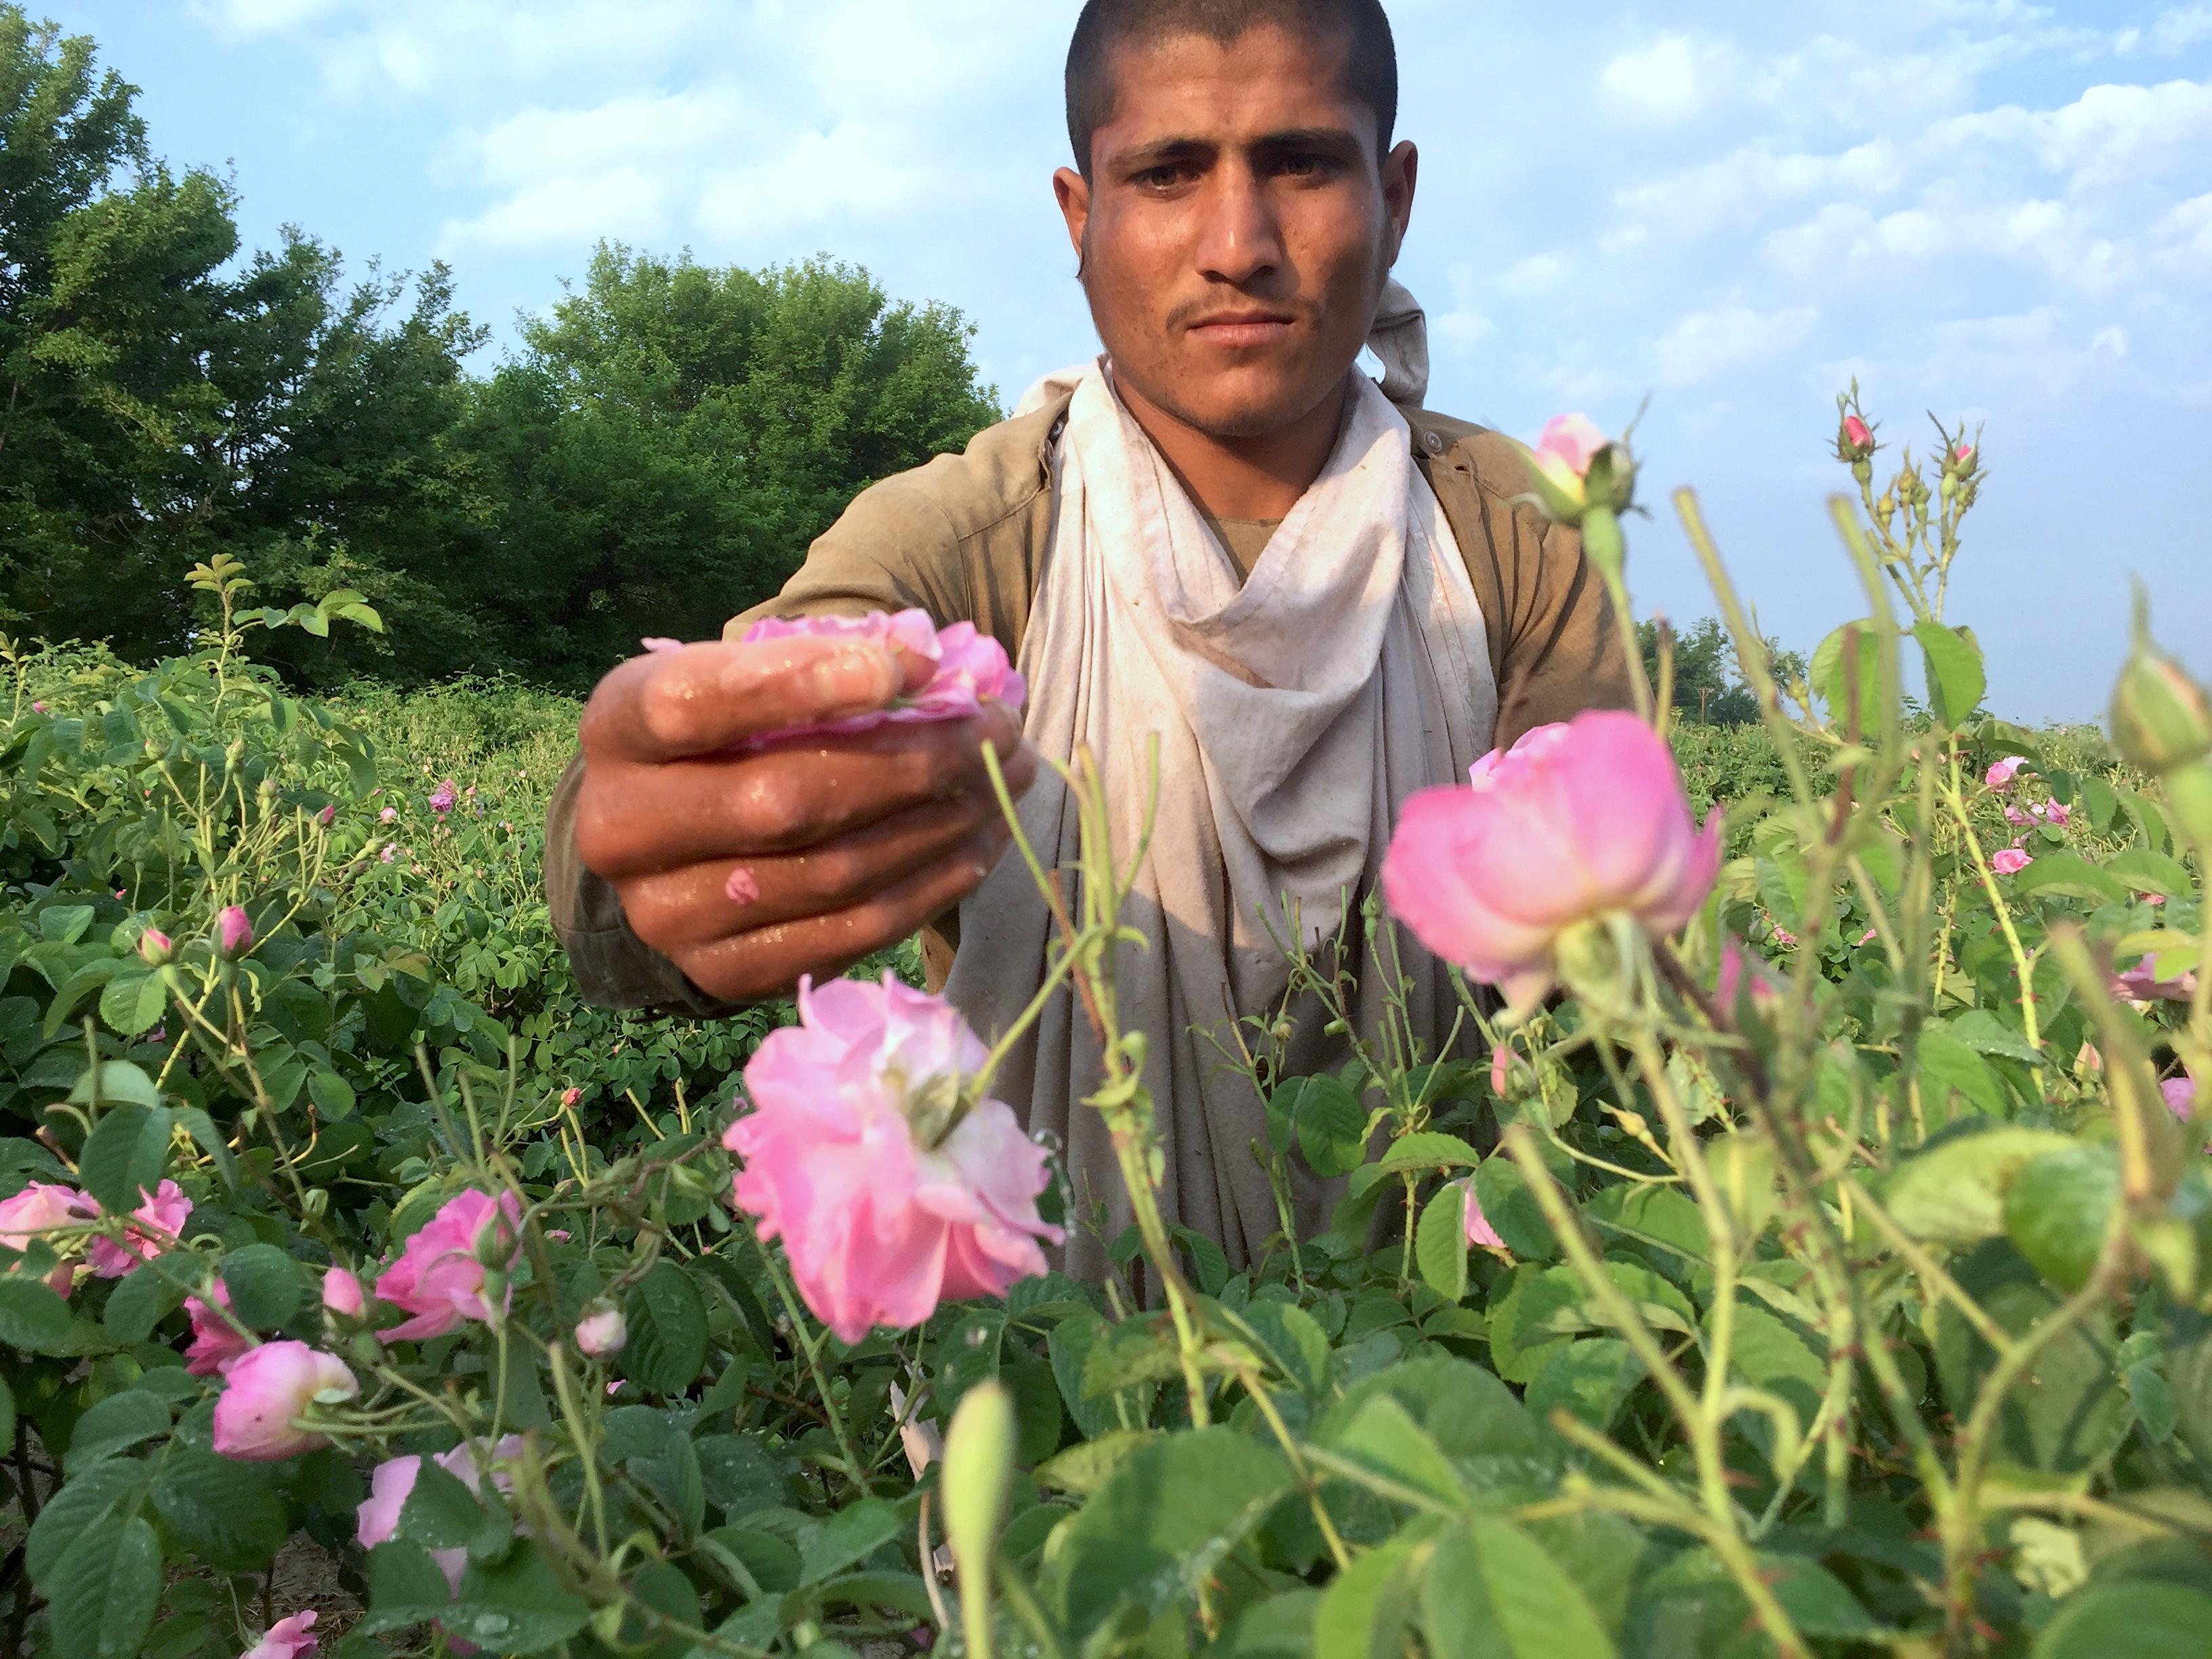 Nangarhar farmers choose roses over poppy, avoid funding Taliban